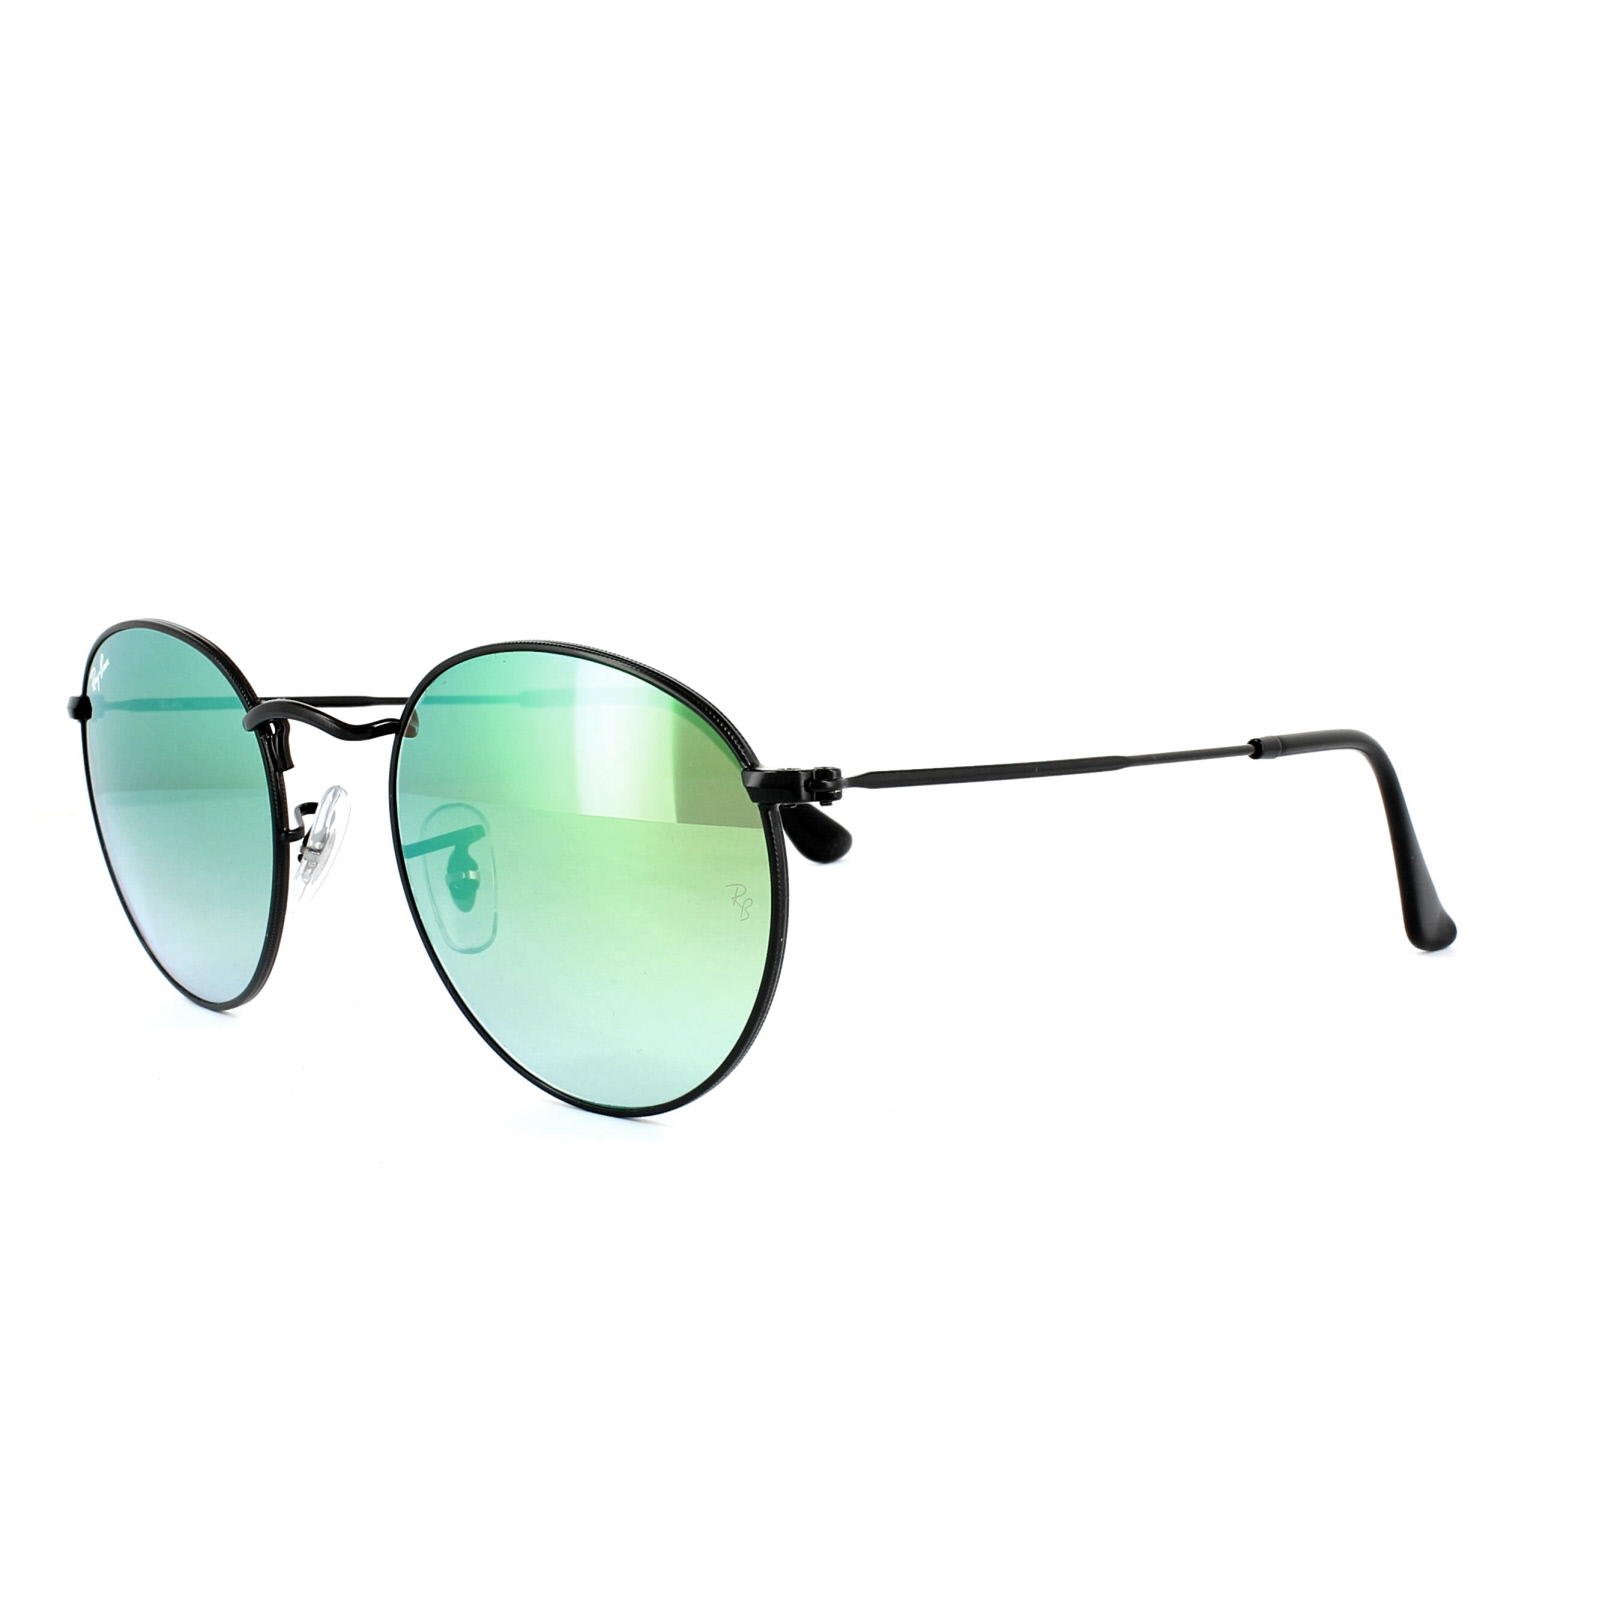 ray ban sonnenbrille grün